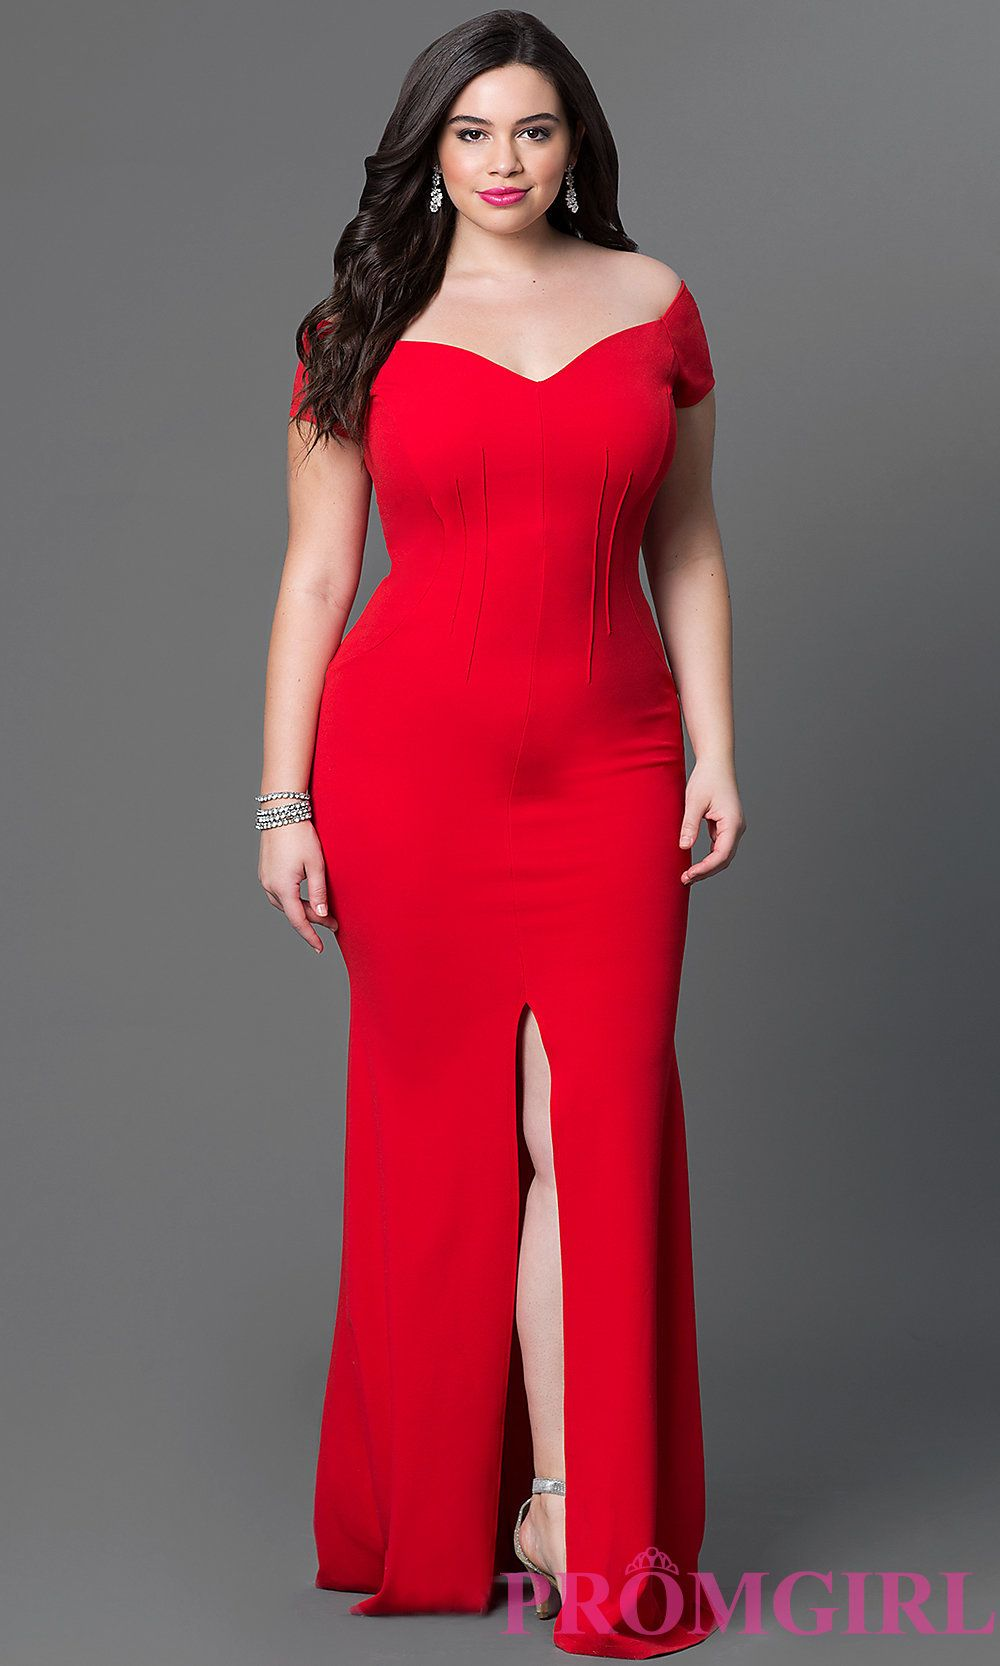 plus size prom dresses on trend for pinterest vestiditos